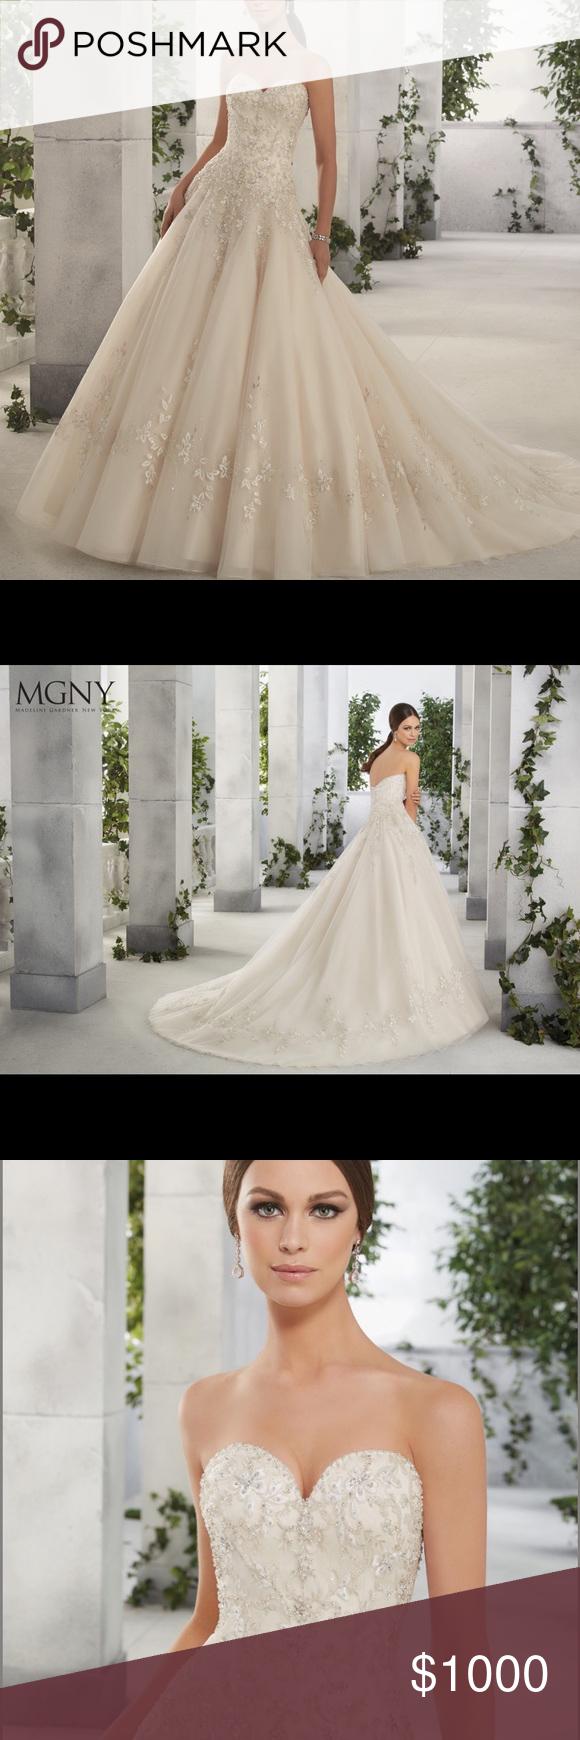 Madeline Gardner Ny Wedding Dress 51249 Ny Wedding Dress Wedding Dresses Wedding Gown Preservation